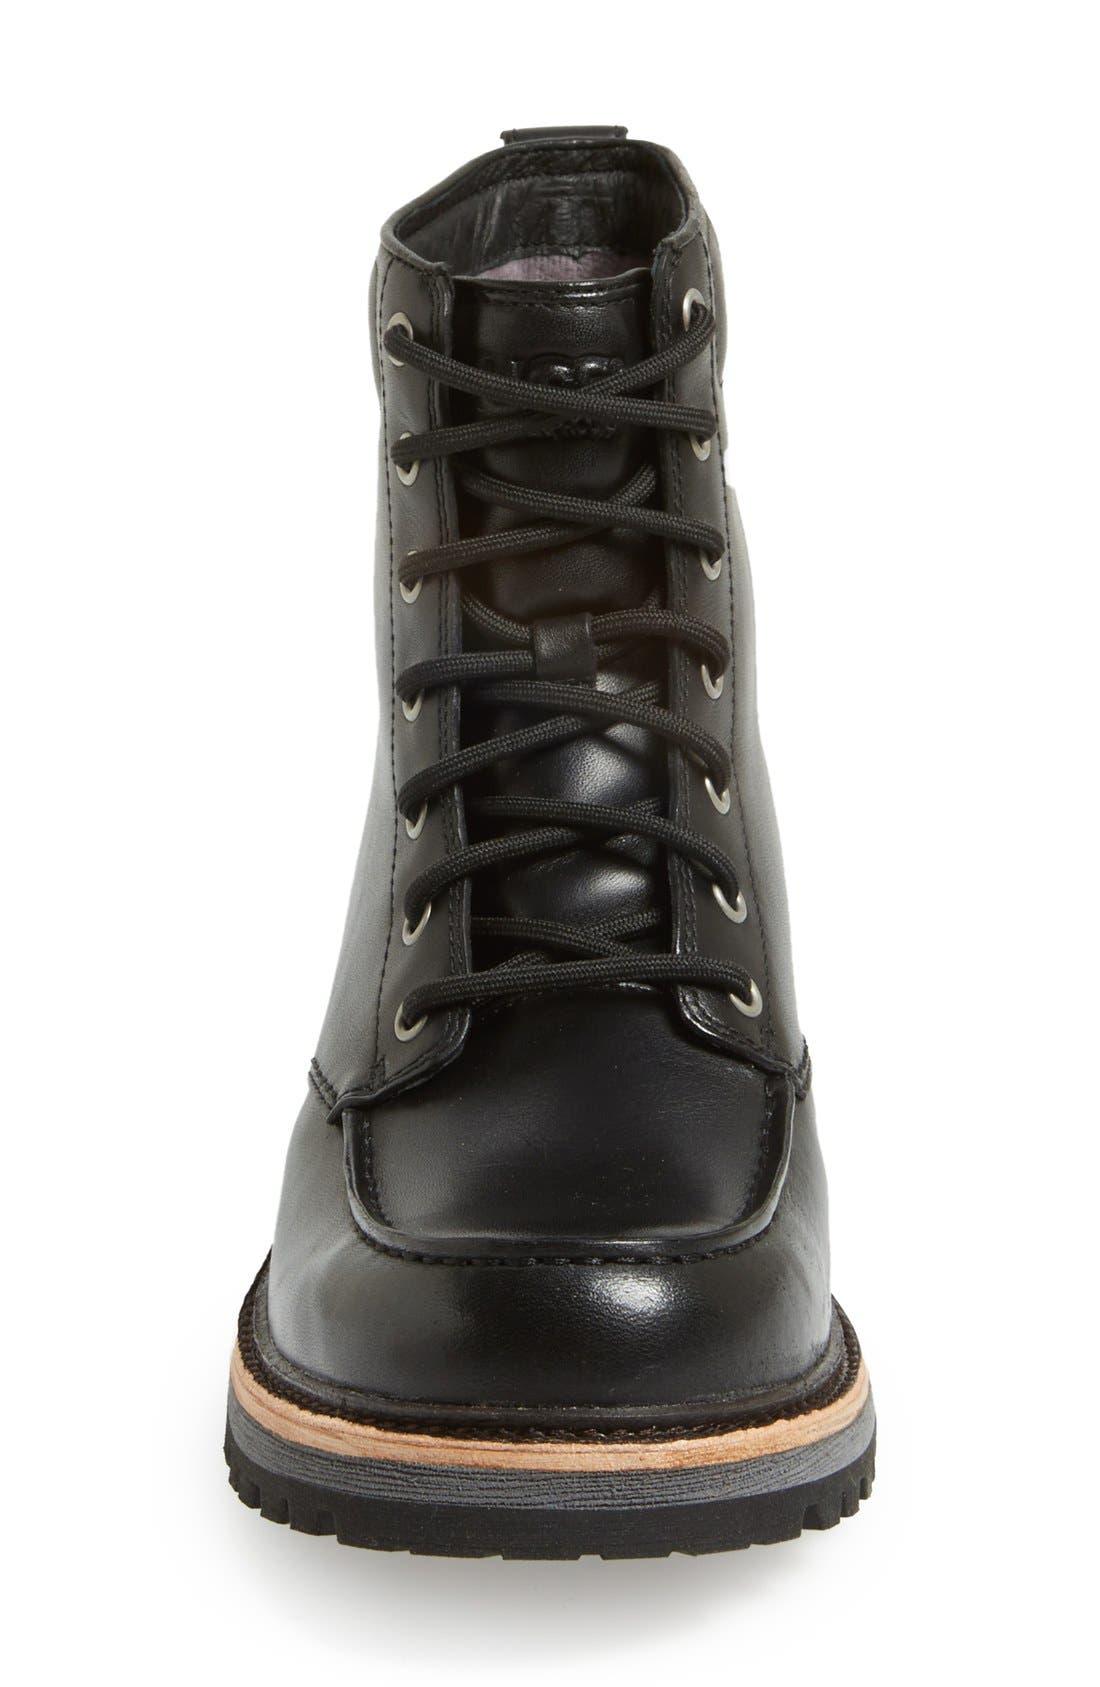 Australia 'Noxon' Waterproof Moc Toe Boot,                             Alternate thumbnail 3, color,                             001